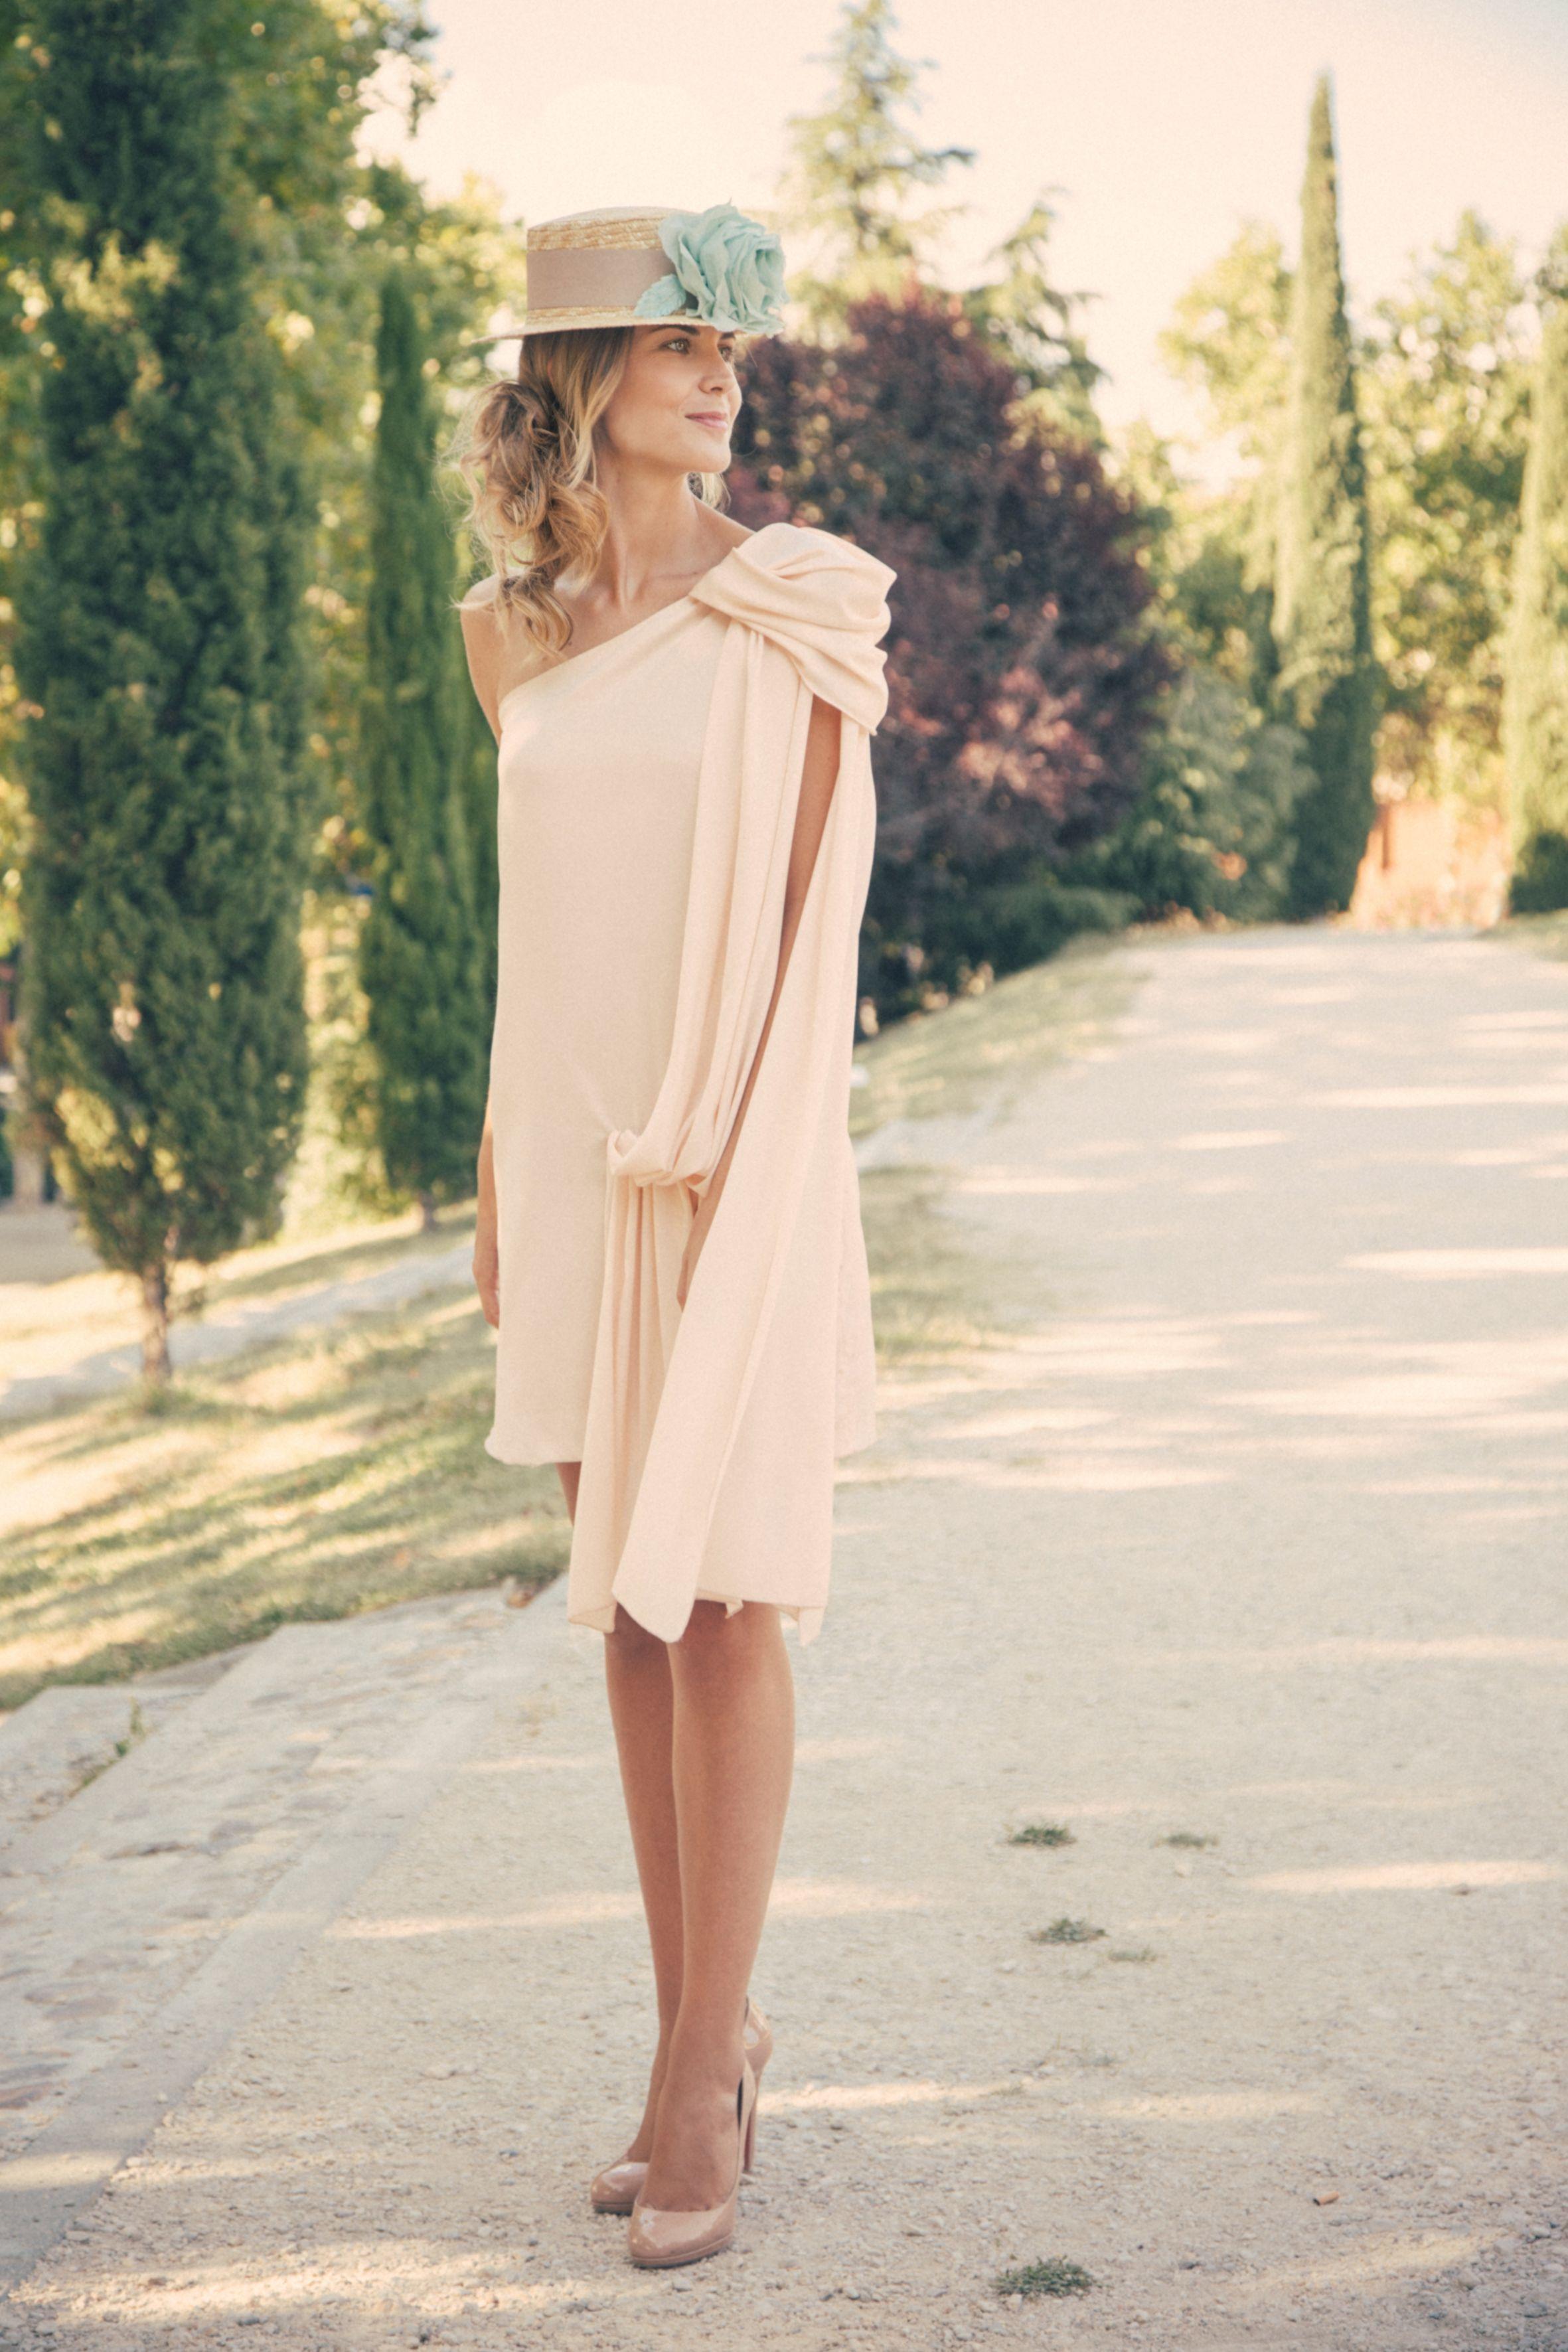 Alquiler de vestidos para madrinas de boda